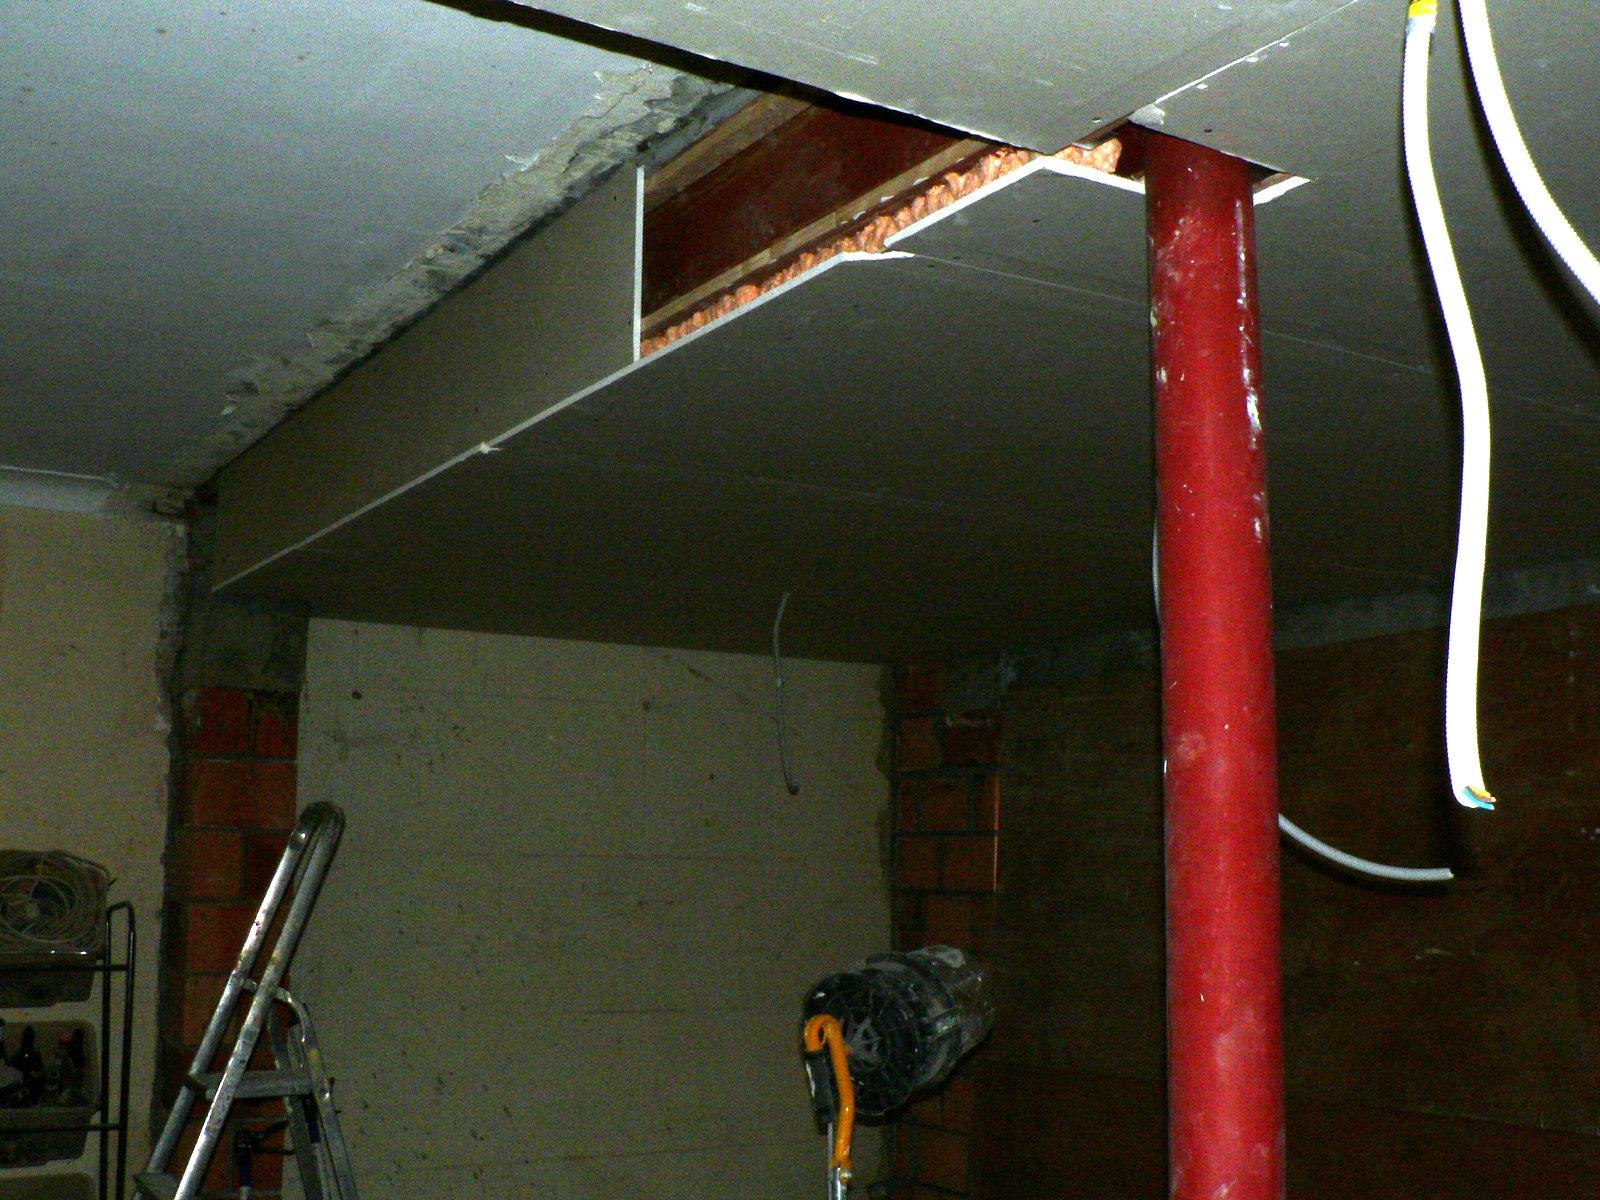 Ons huisje: vals plafond boven keuken